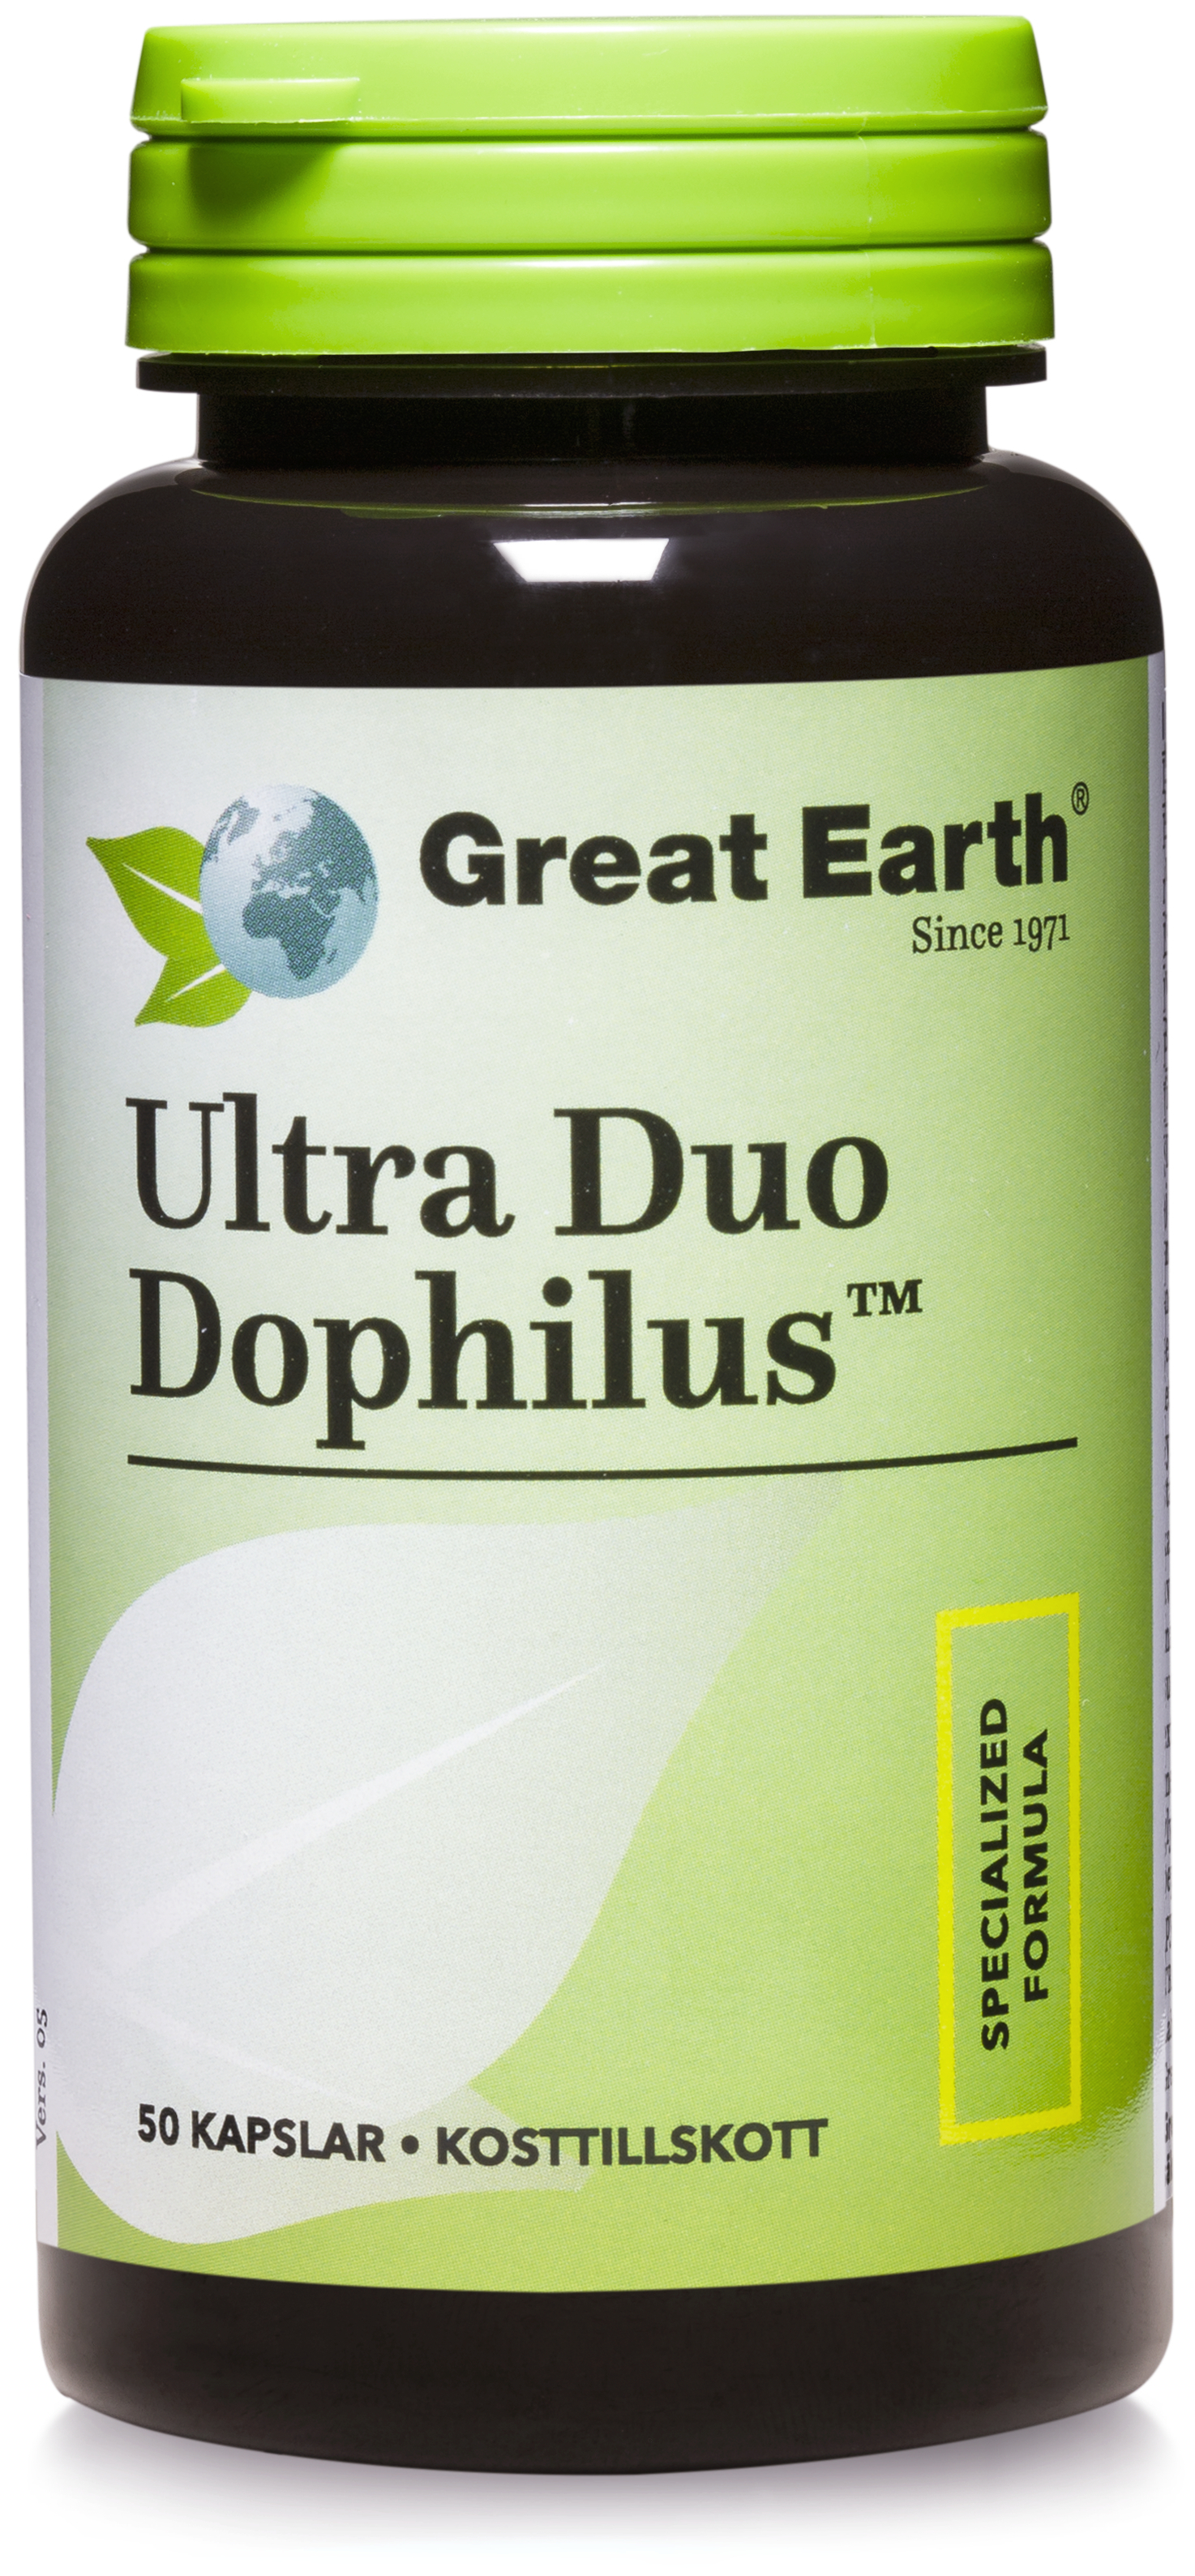 ultra duo dophilus från great earth